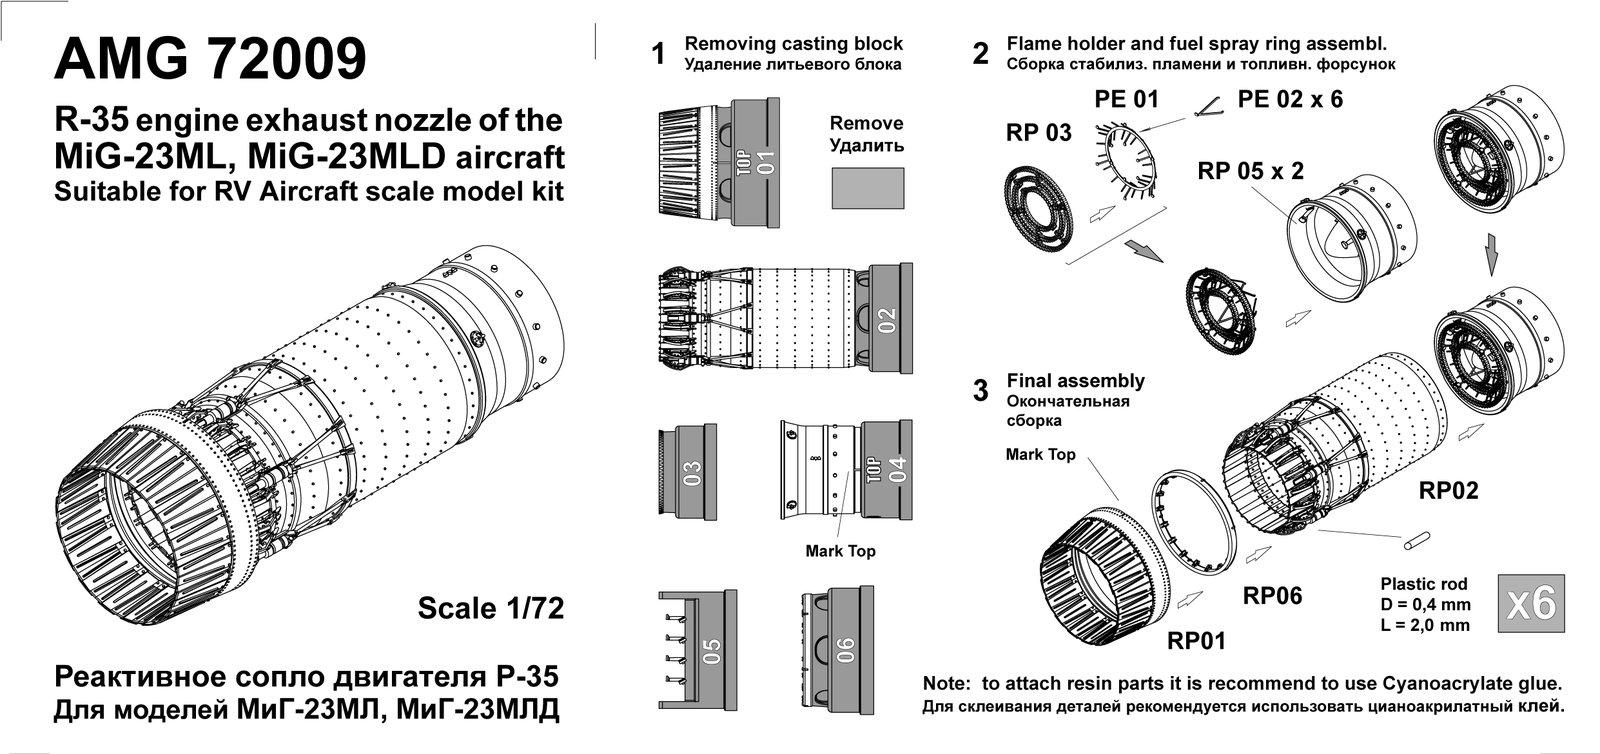 72009-MiG-23-MLD-nozzle